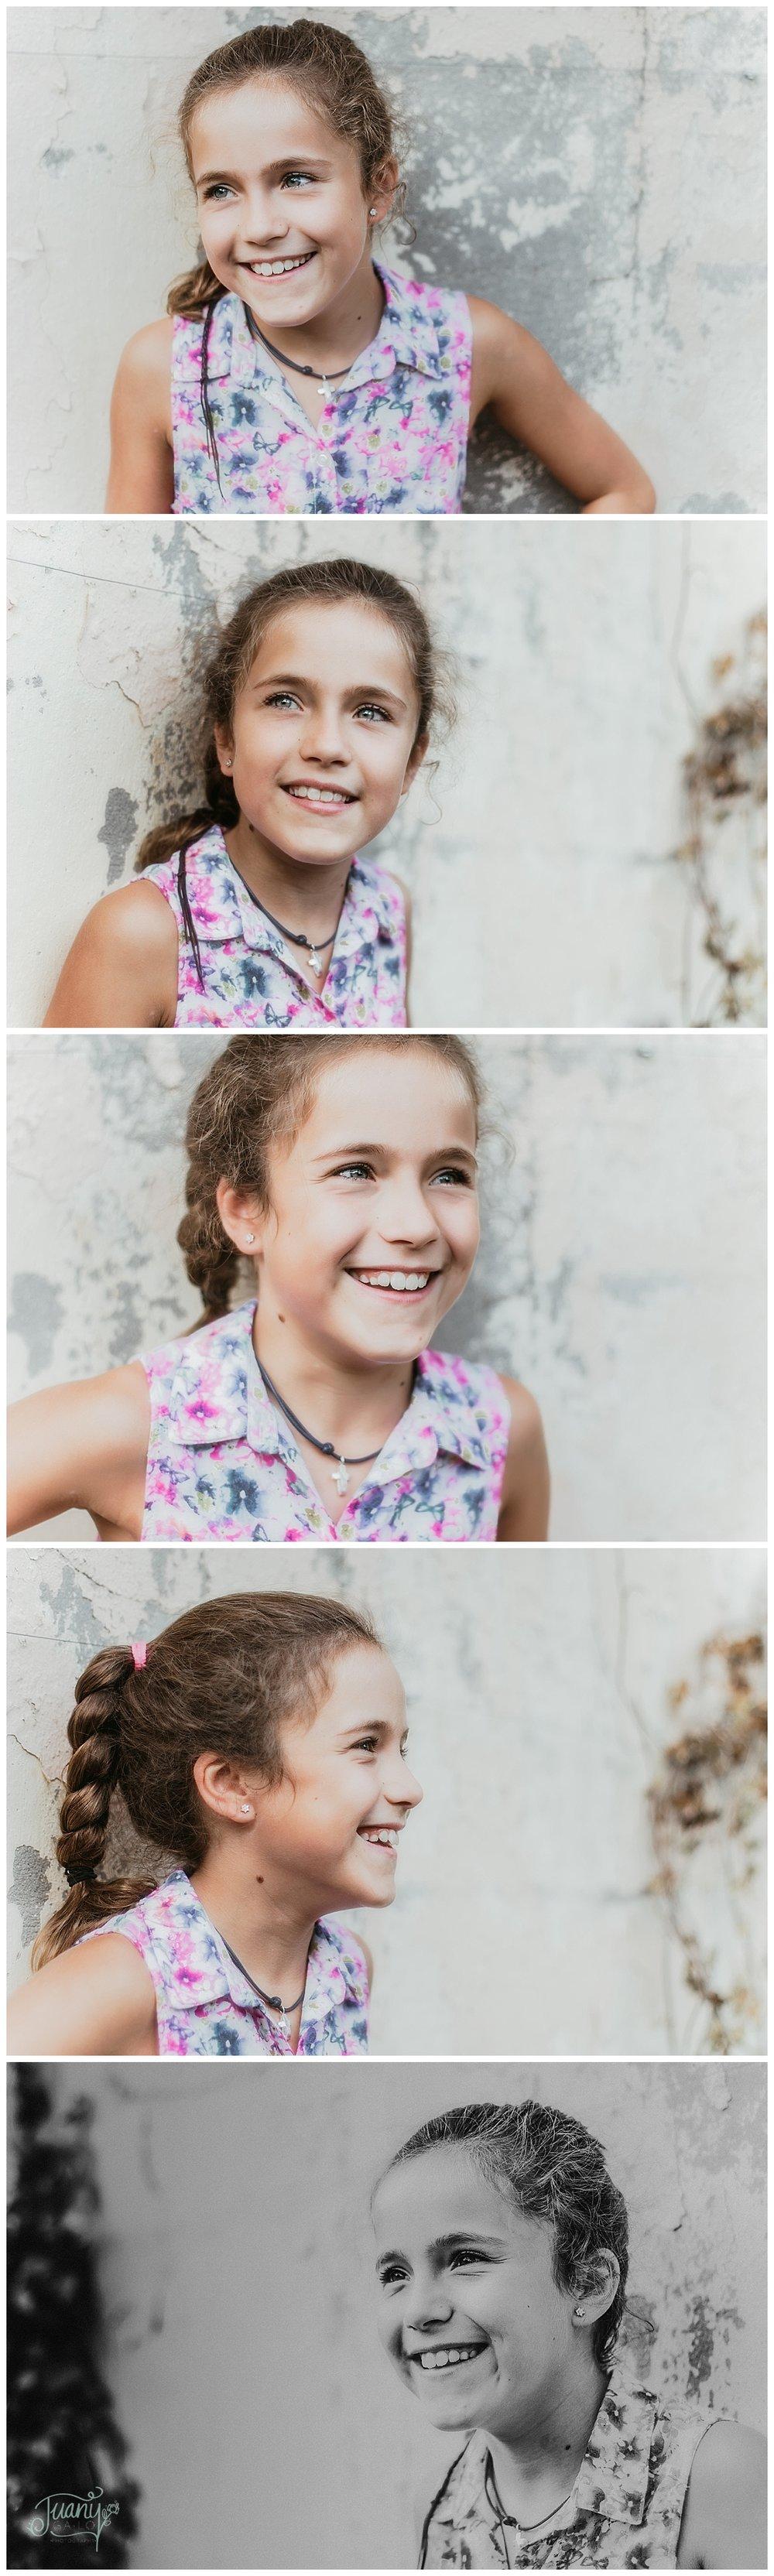 Sesión fotográfica infantil de Mencía_0016.jpg